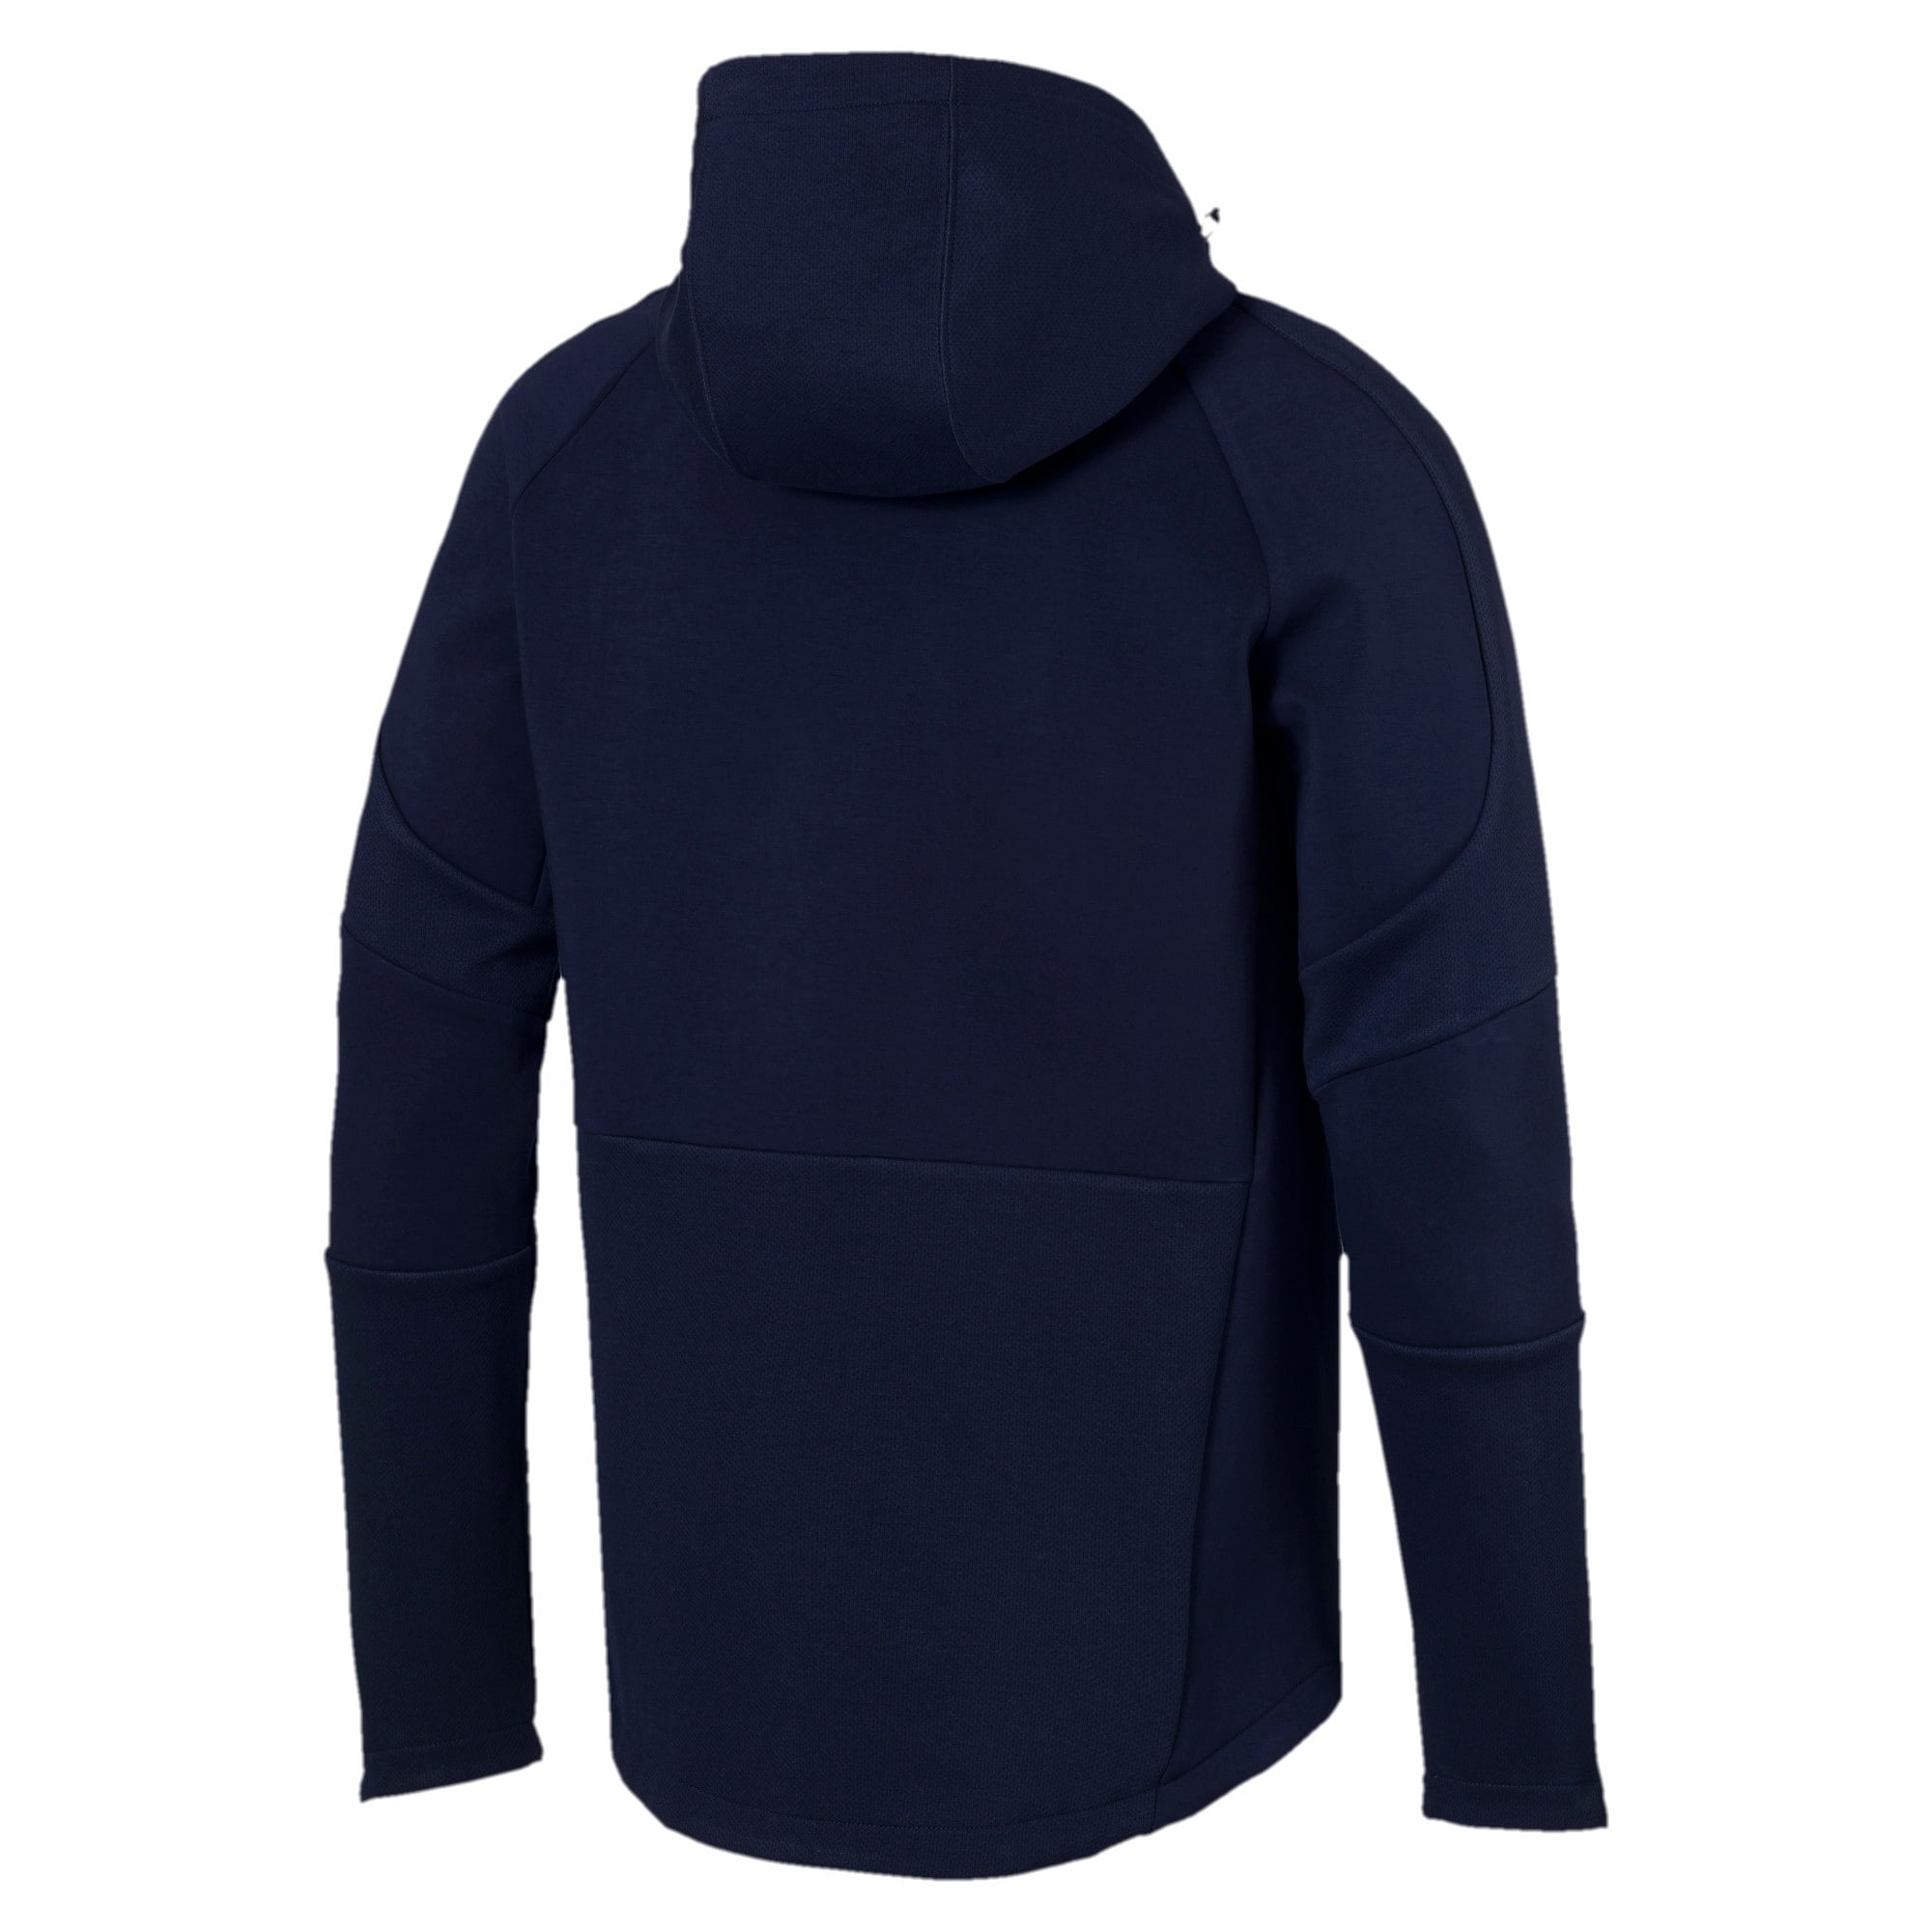 Thumbnail 3 of Evostripe Move Hooded Jacket, Peacoat, medium